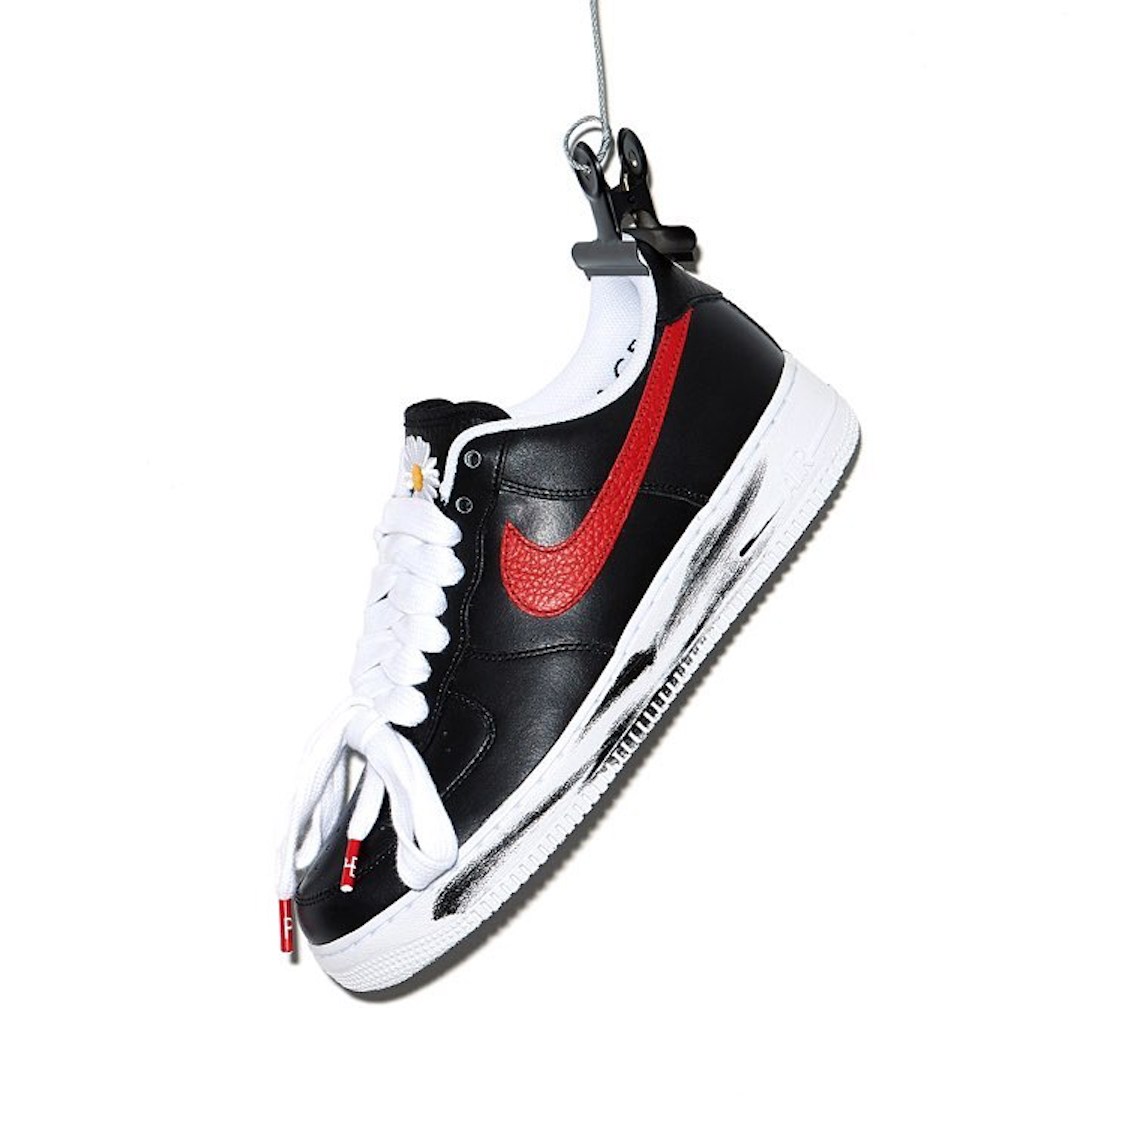 Where to Buy G Dragon's PEACEMINUSONE x Nike Air Force 1